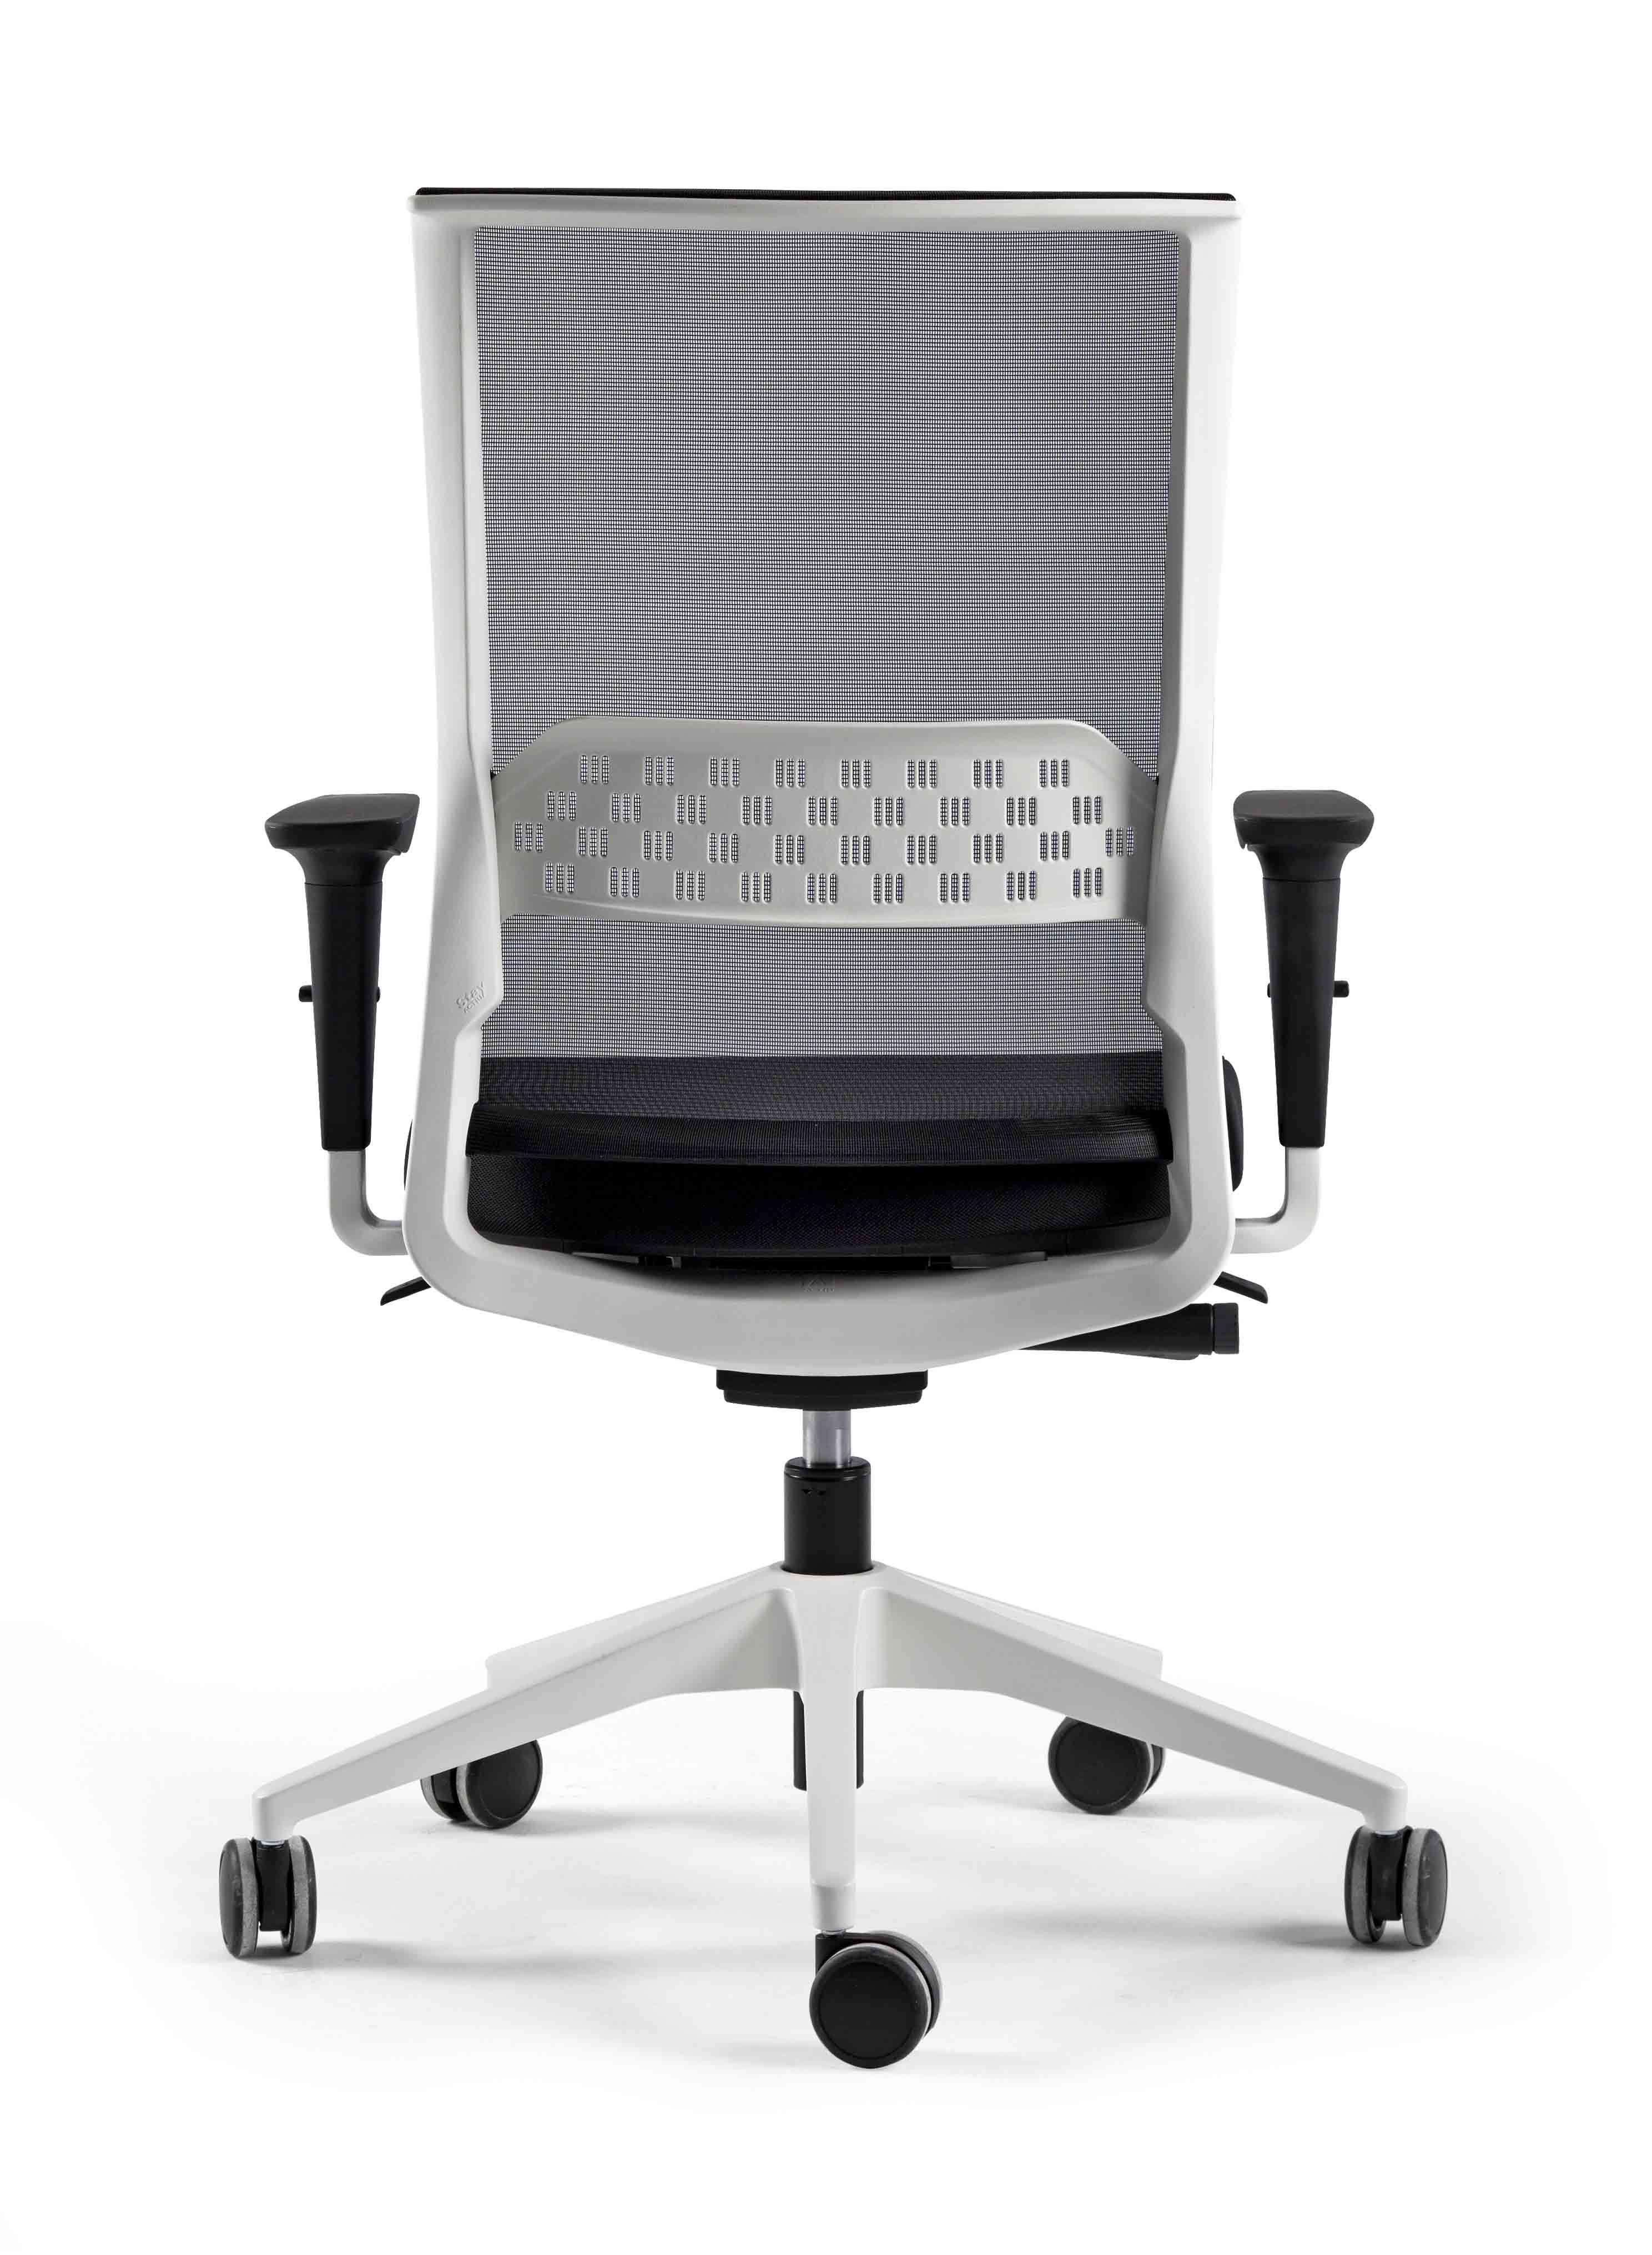 Silla stay ergon mica y c moda muebles de oficina spacio for Sillas ergonomicas con apoyo lumbar